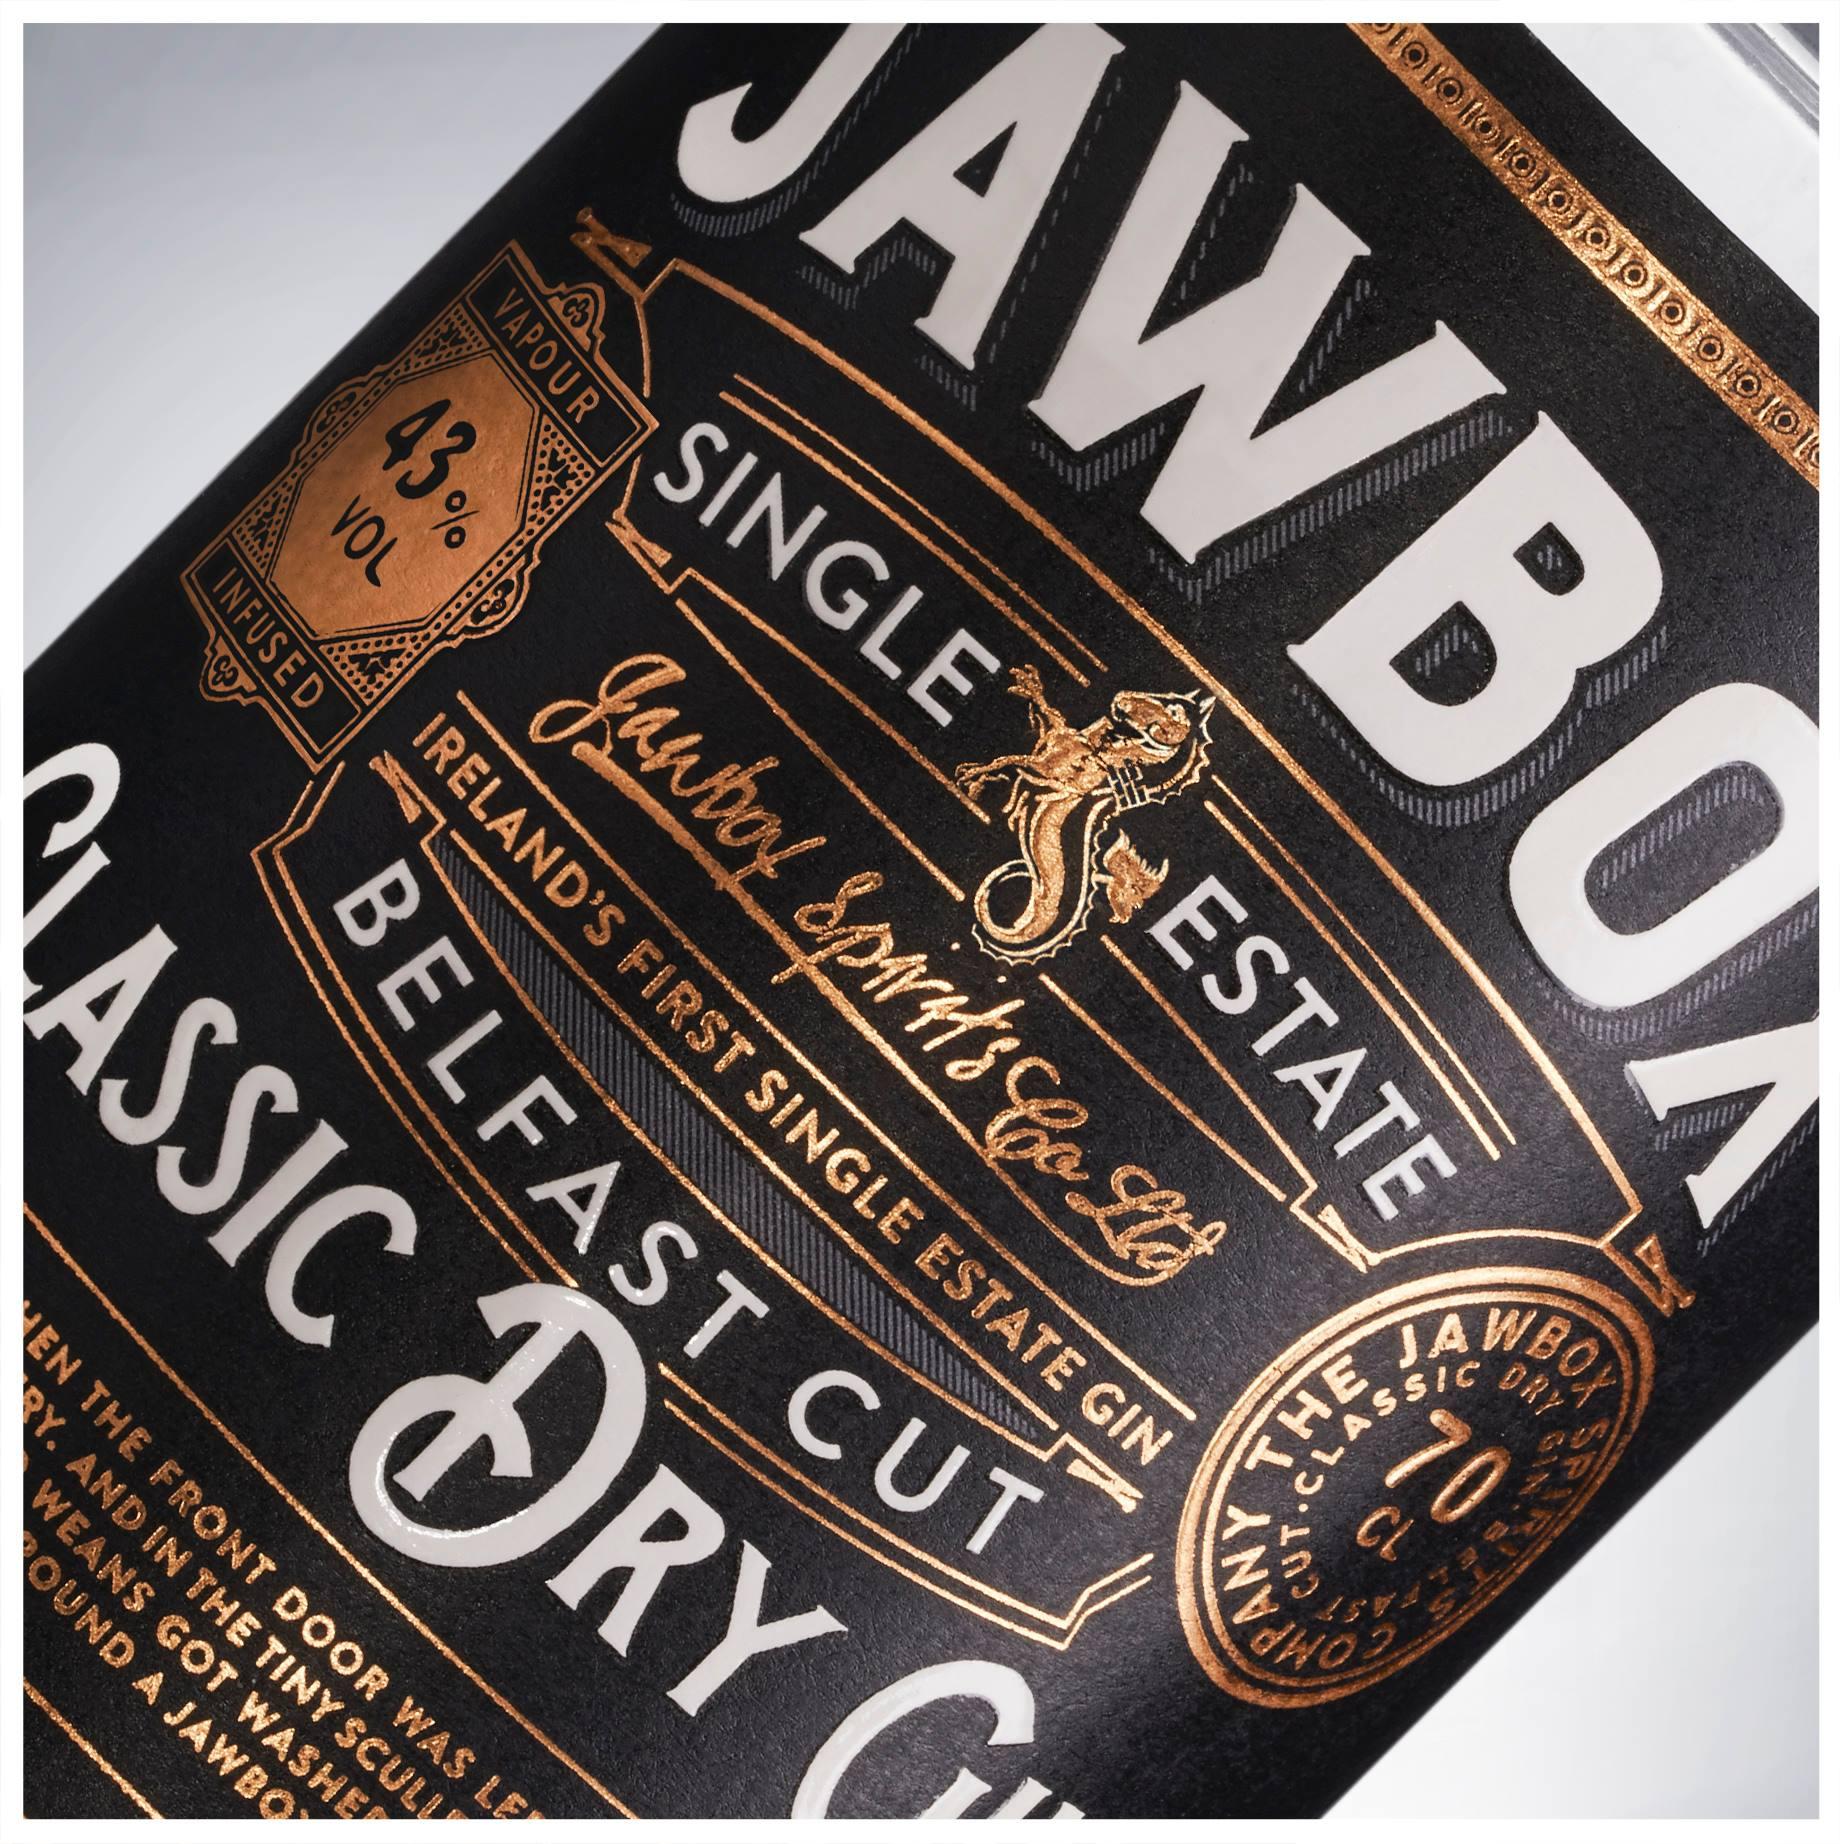 Jawbox Gin: Client Drinksology / Jawbox Gin